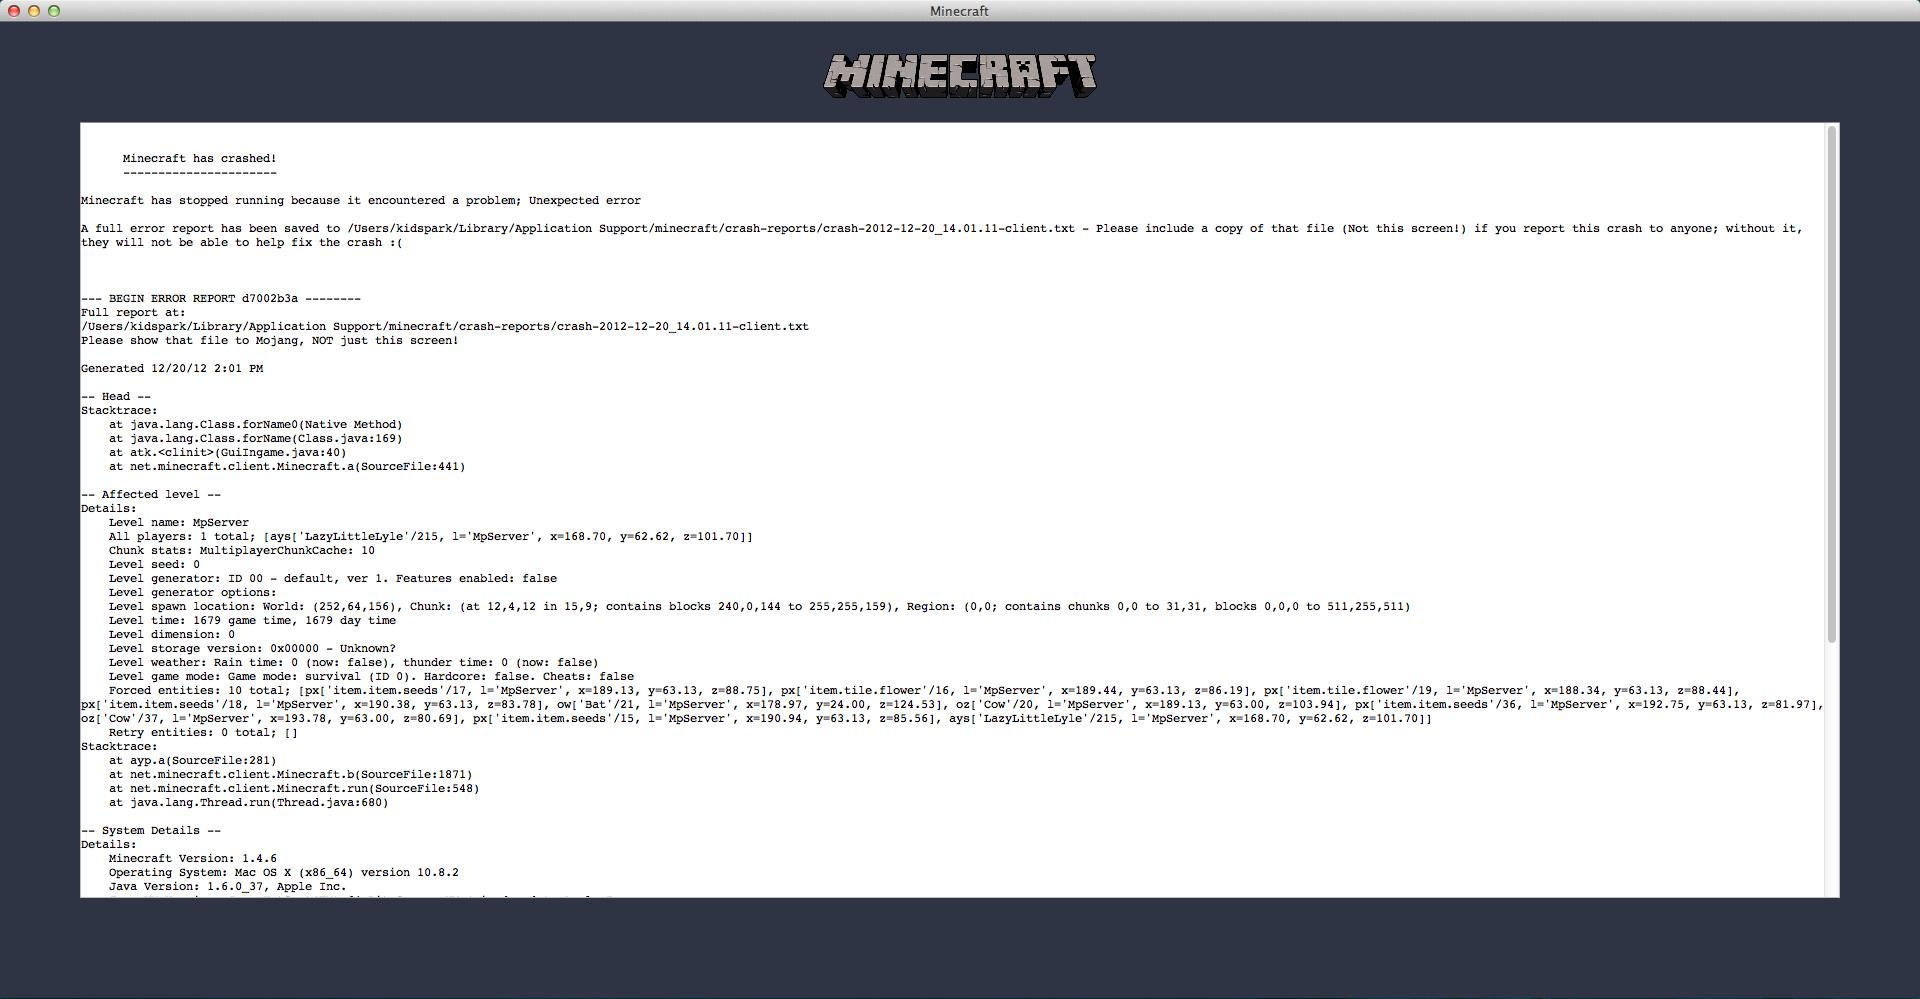 Mc 5084 minecraft crashing when dying jira screen shot 2012 12 20 at 20114 pmg ccuart Gallery